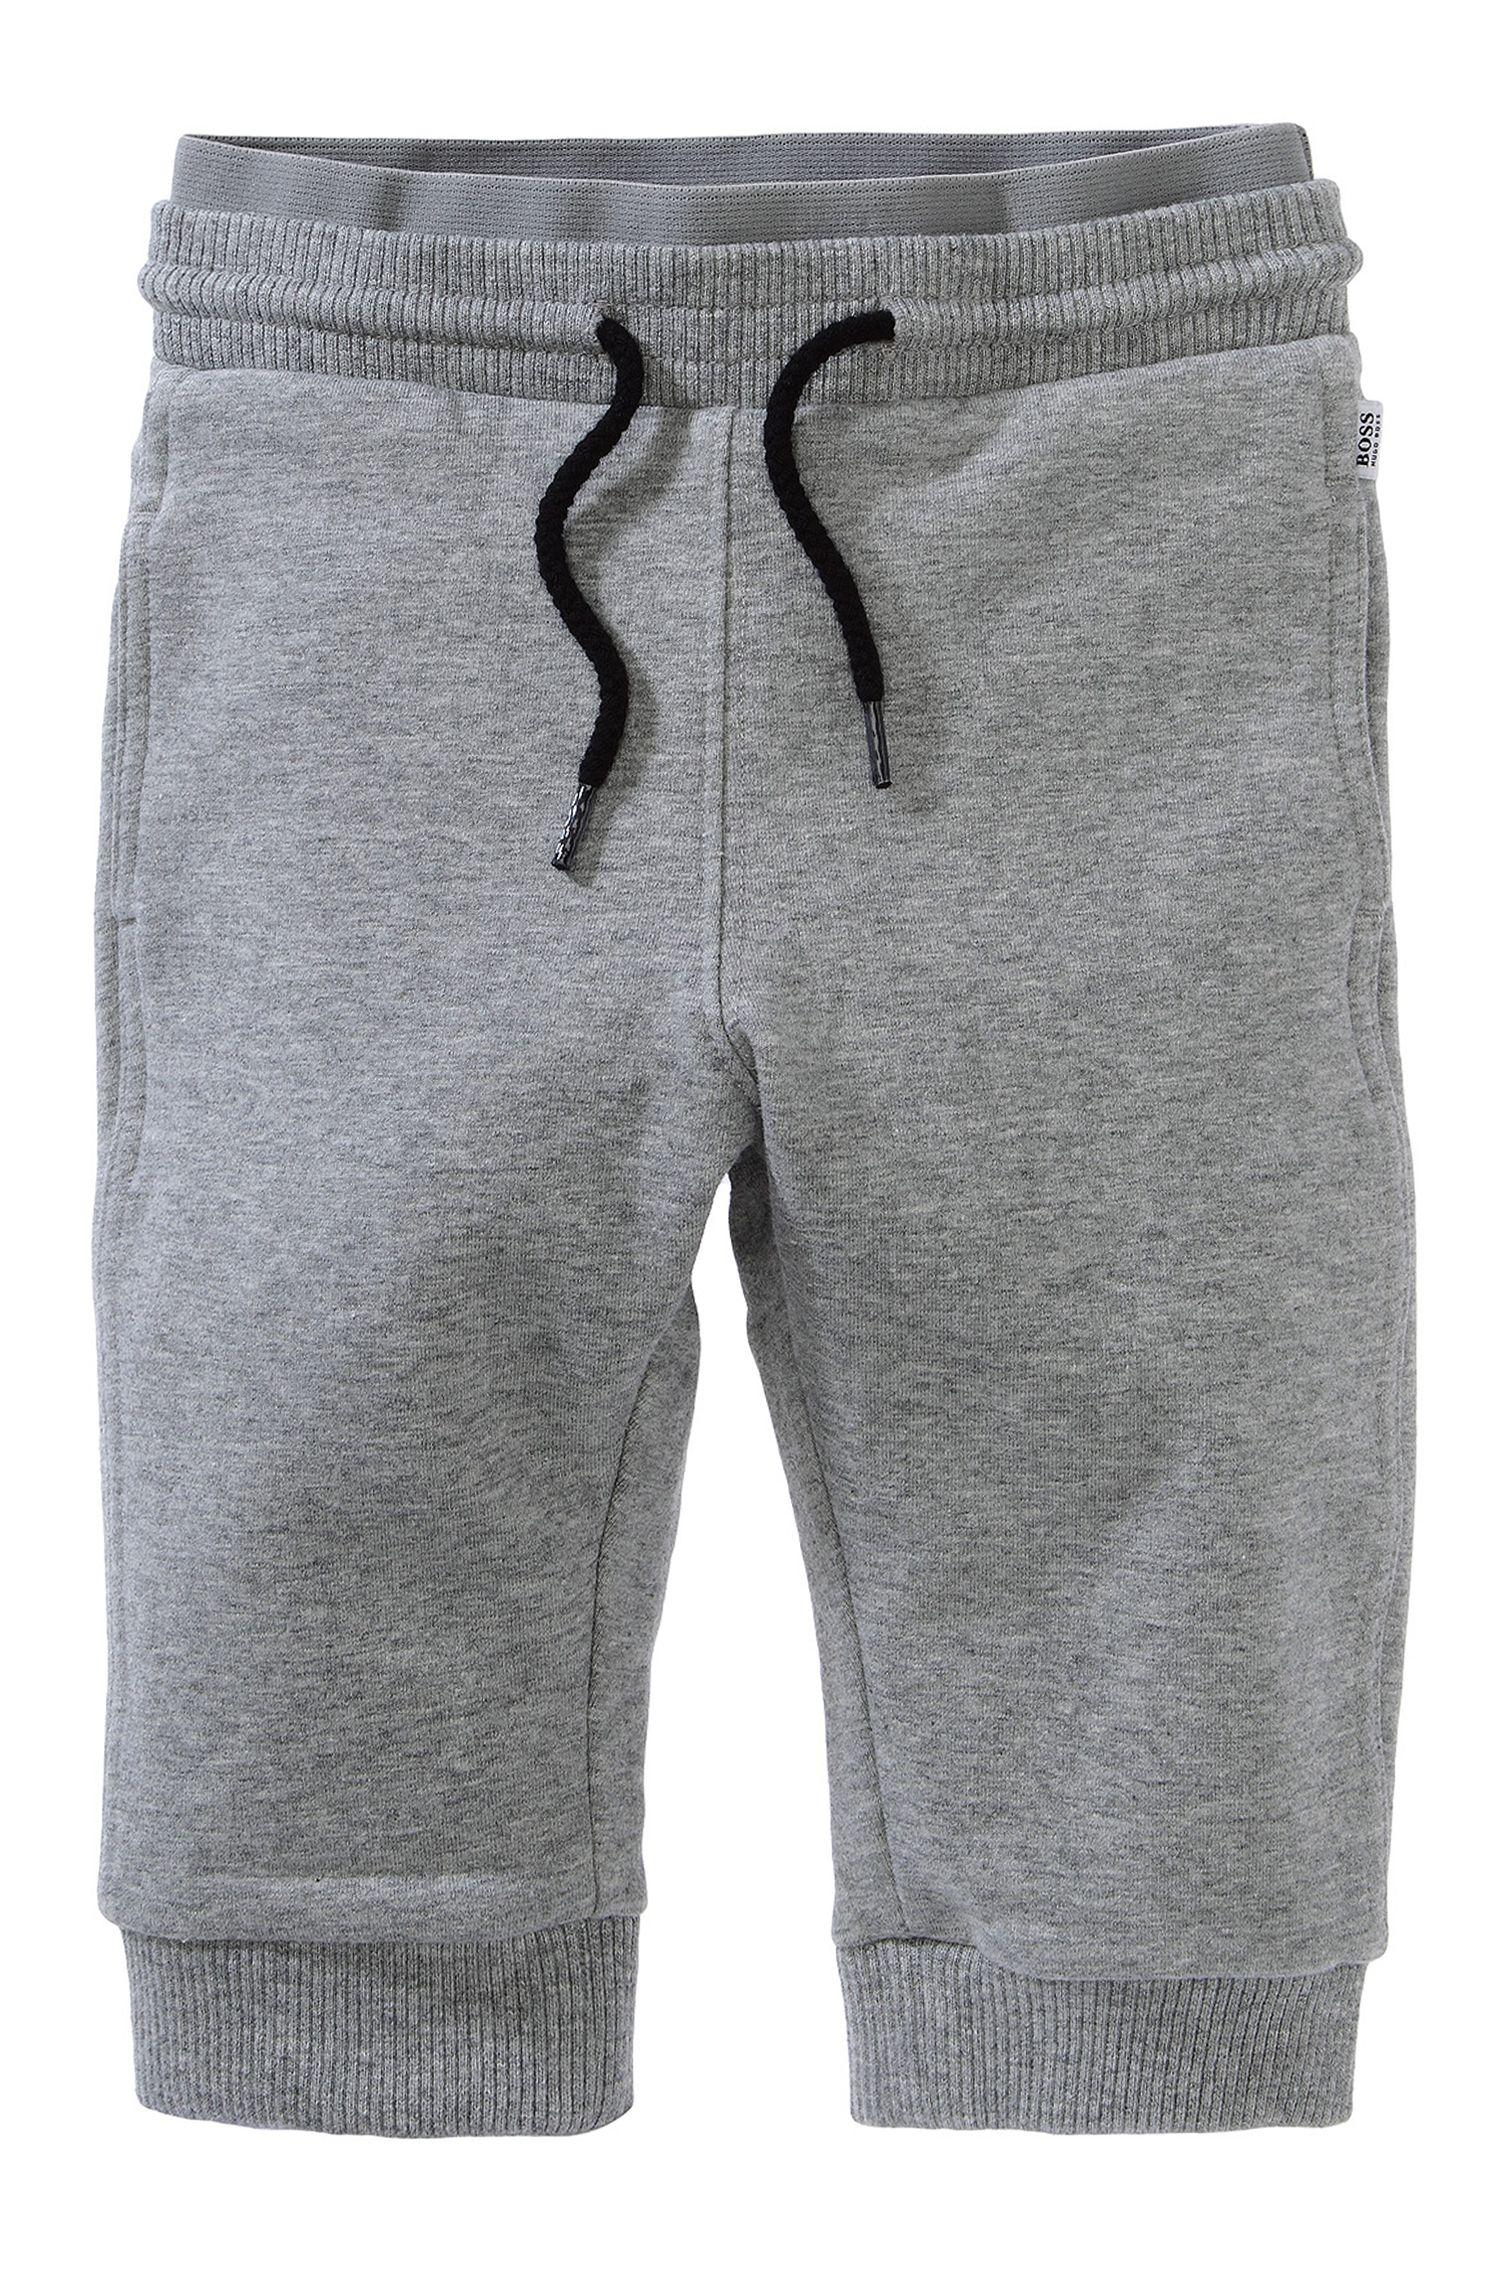 'J04120' | Toddler Stretch Cotton Blend Performance Pants